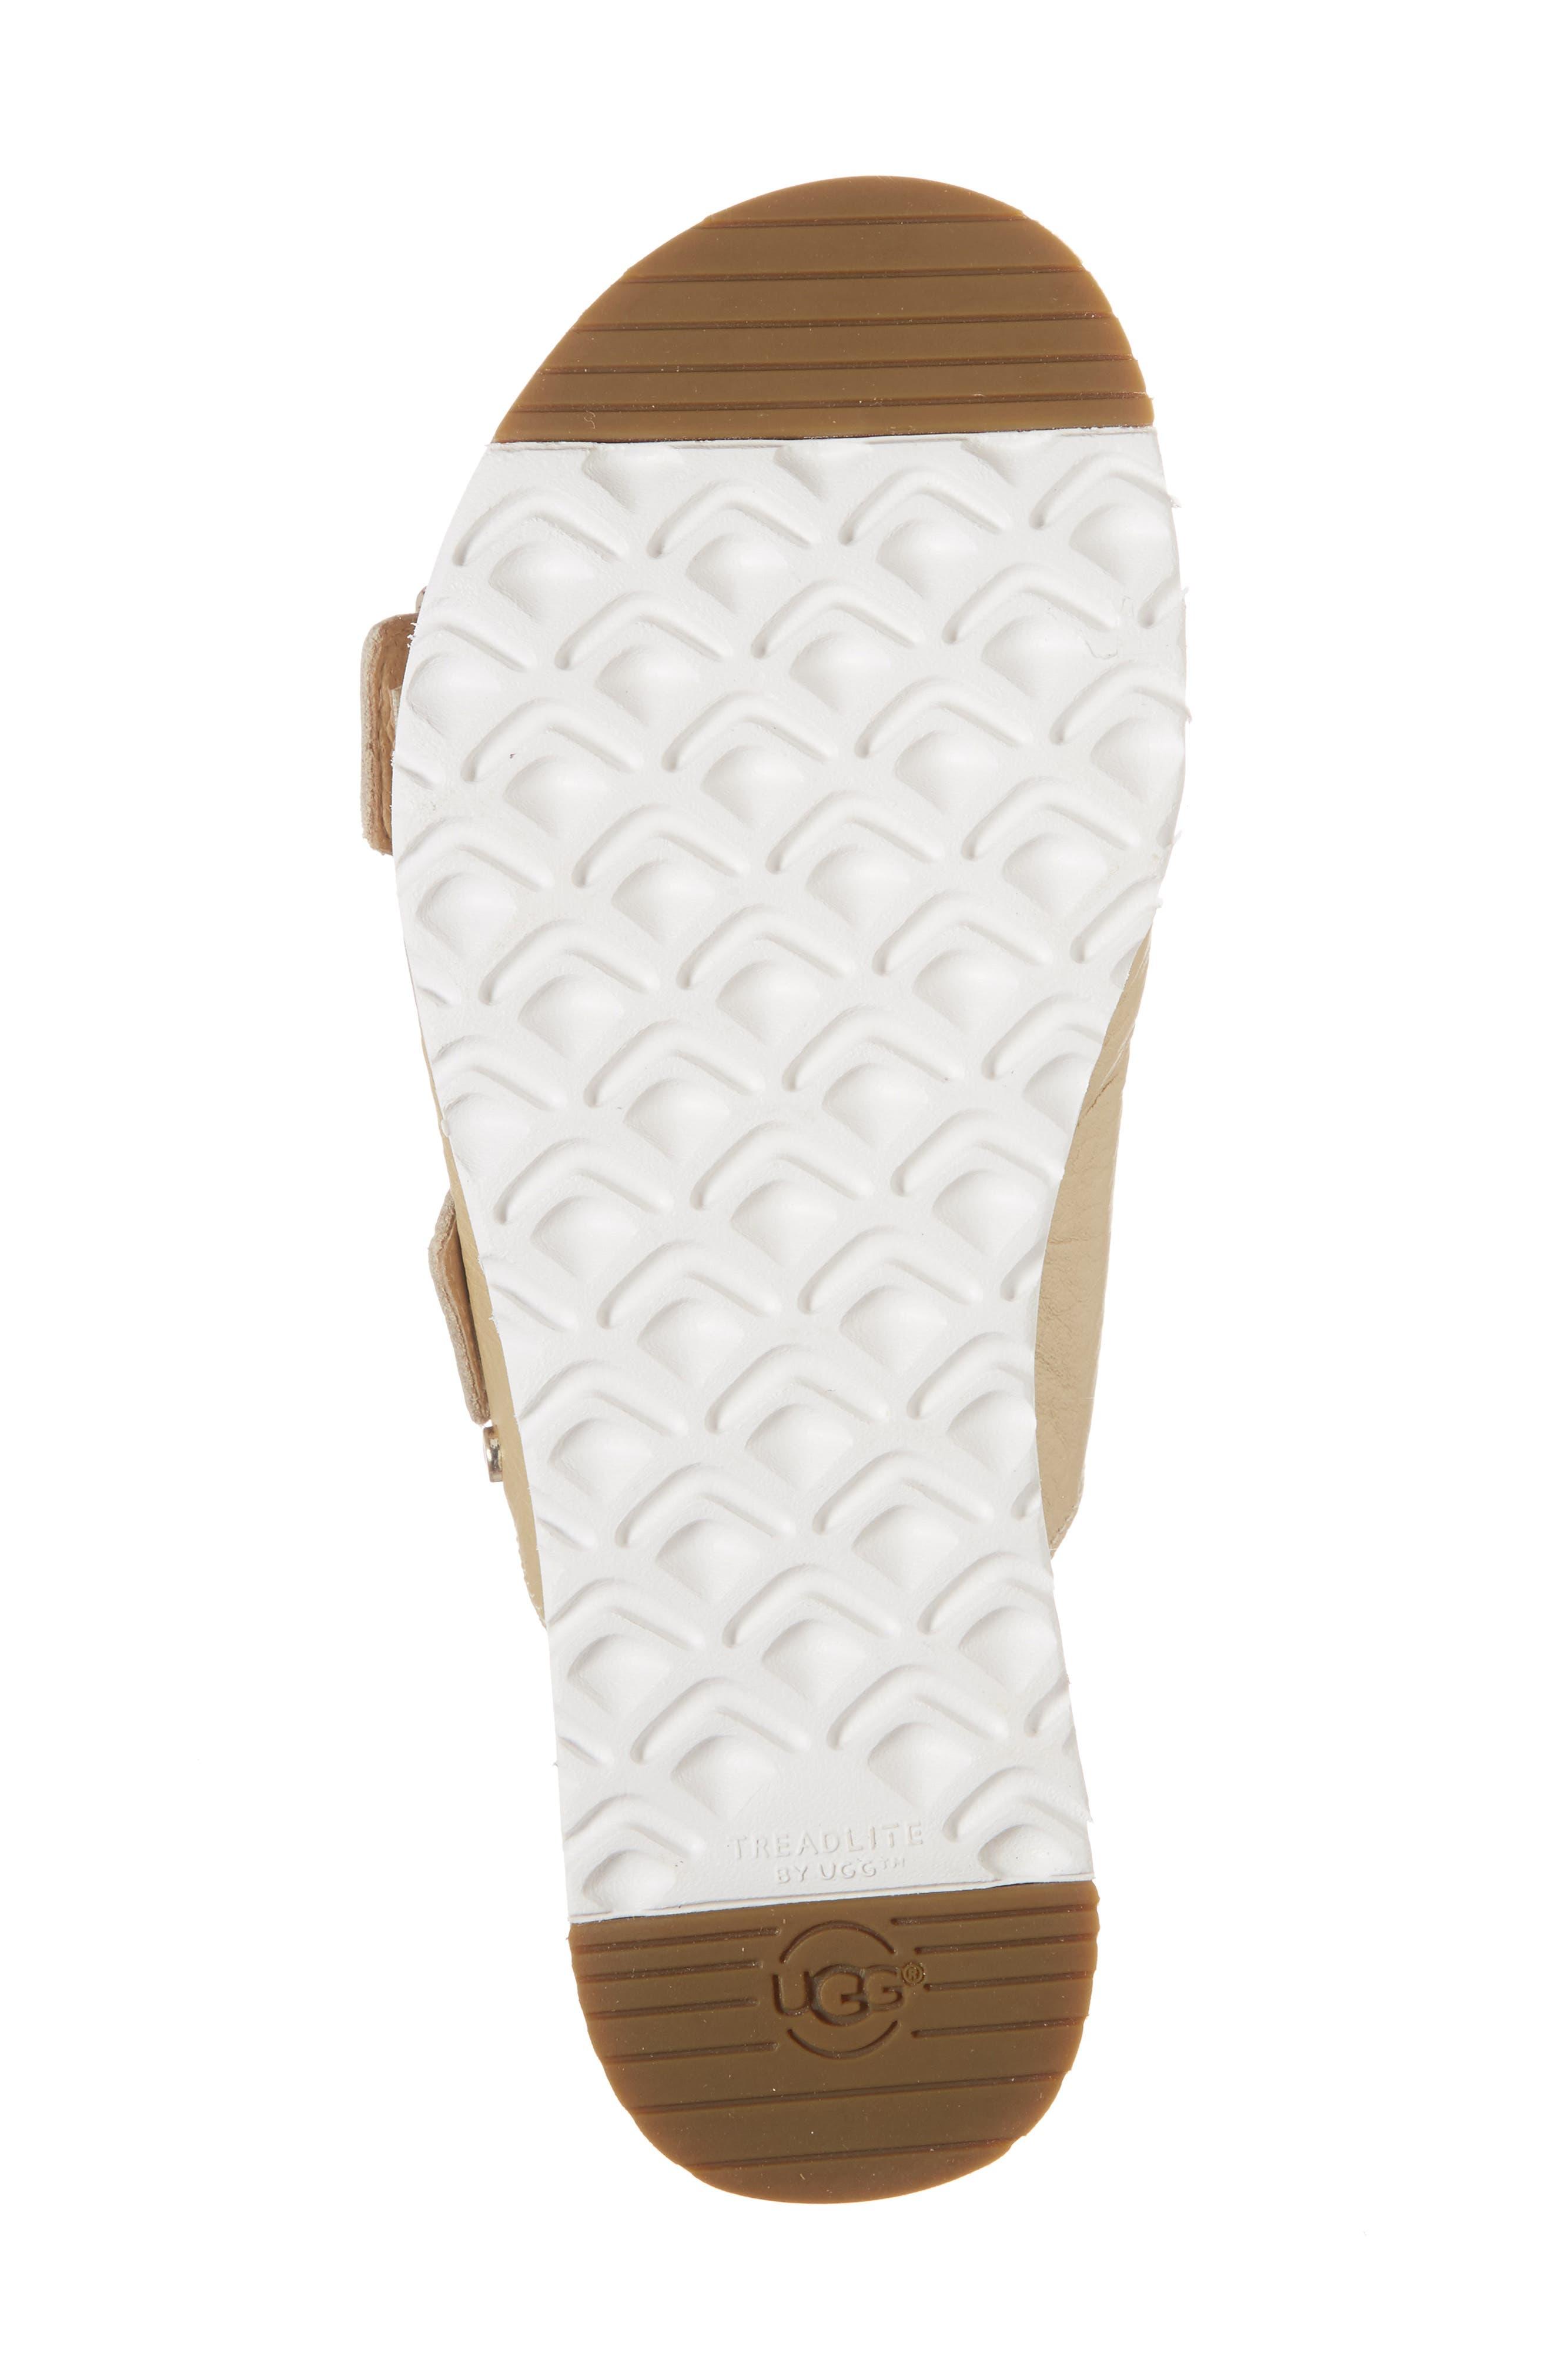 Cammie Platform Sandal,                             Alternate thumbnail 6, color,                             Gold Patent Leather